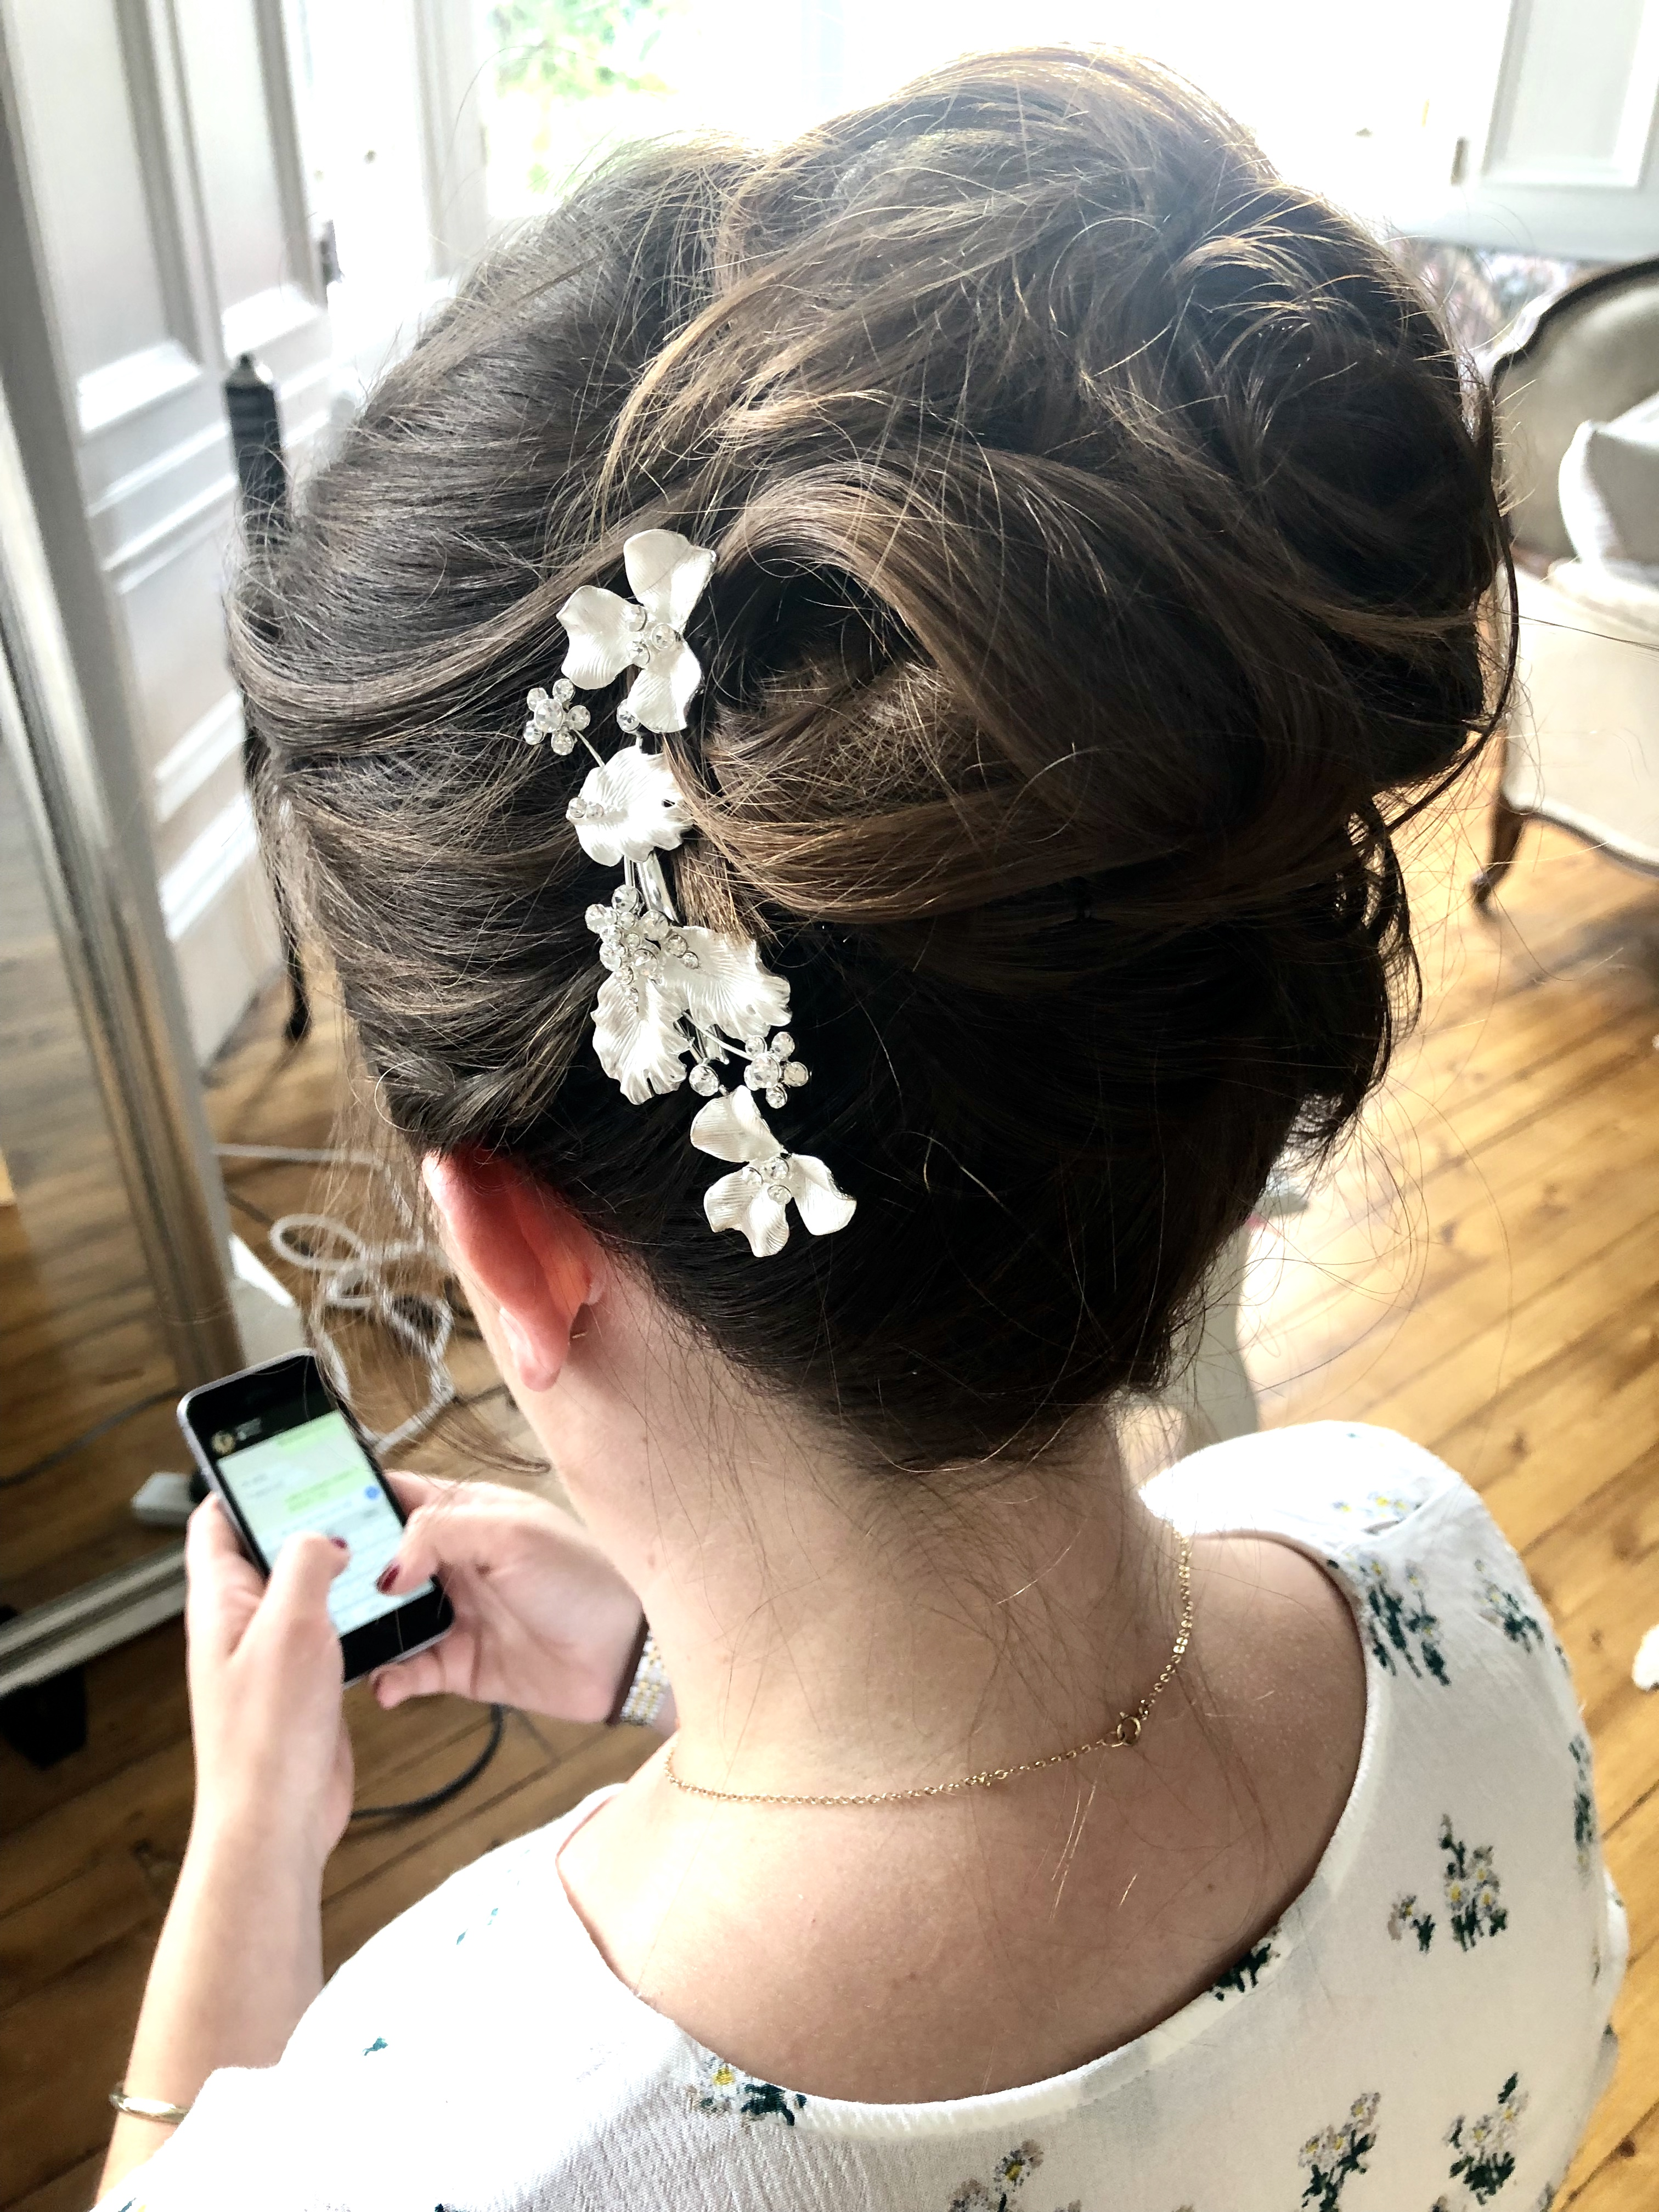 About Edinburgh Circles Bridal Hair And Makeup Mobile